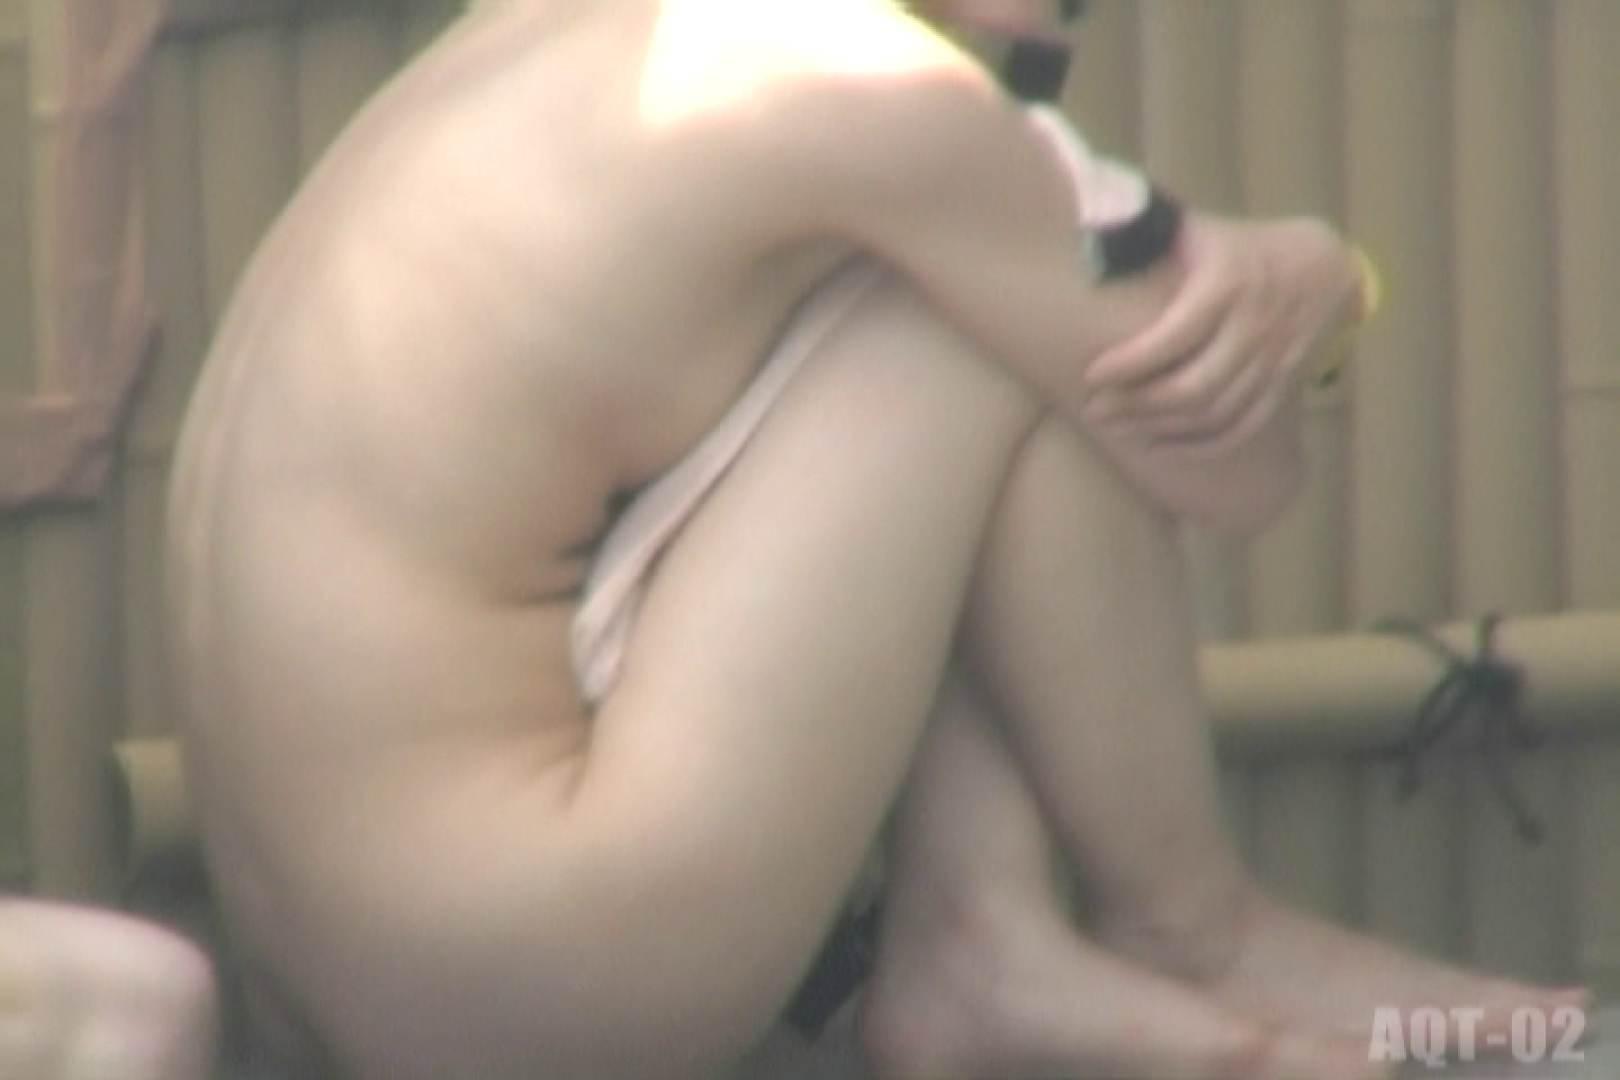 女露天風呂劇場 Vol.44 露天丸見え | 丸見え  112画像 91